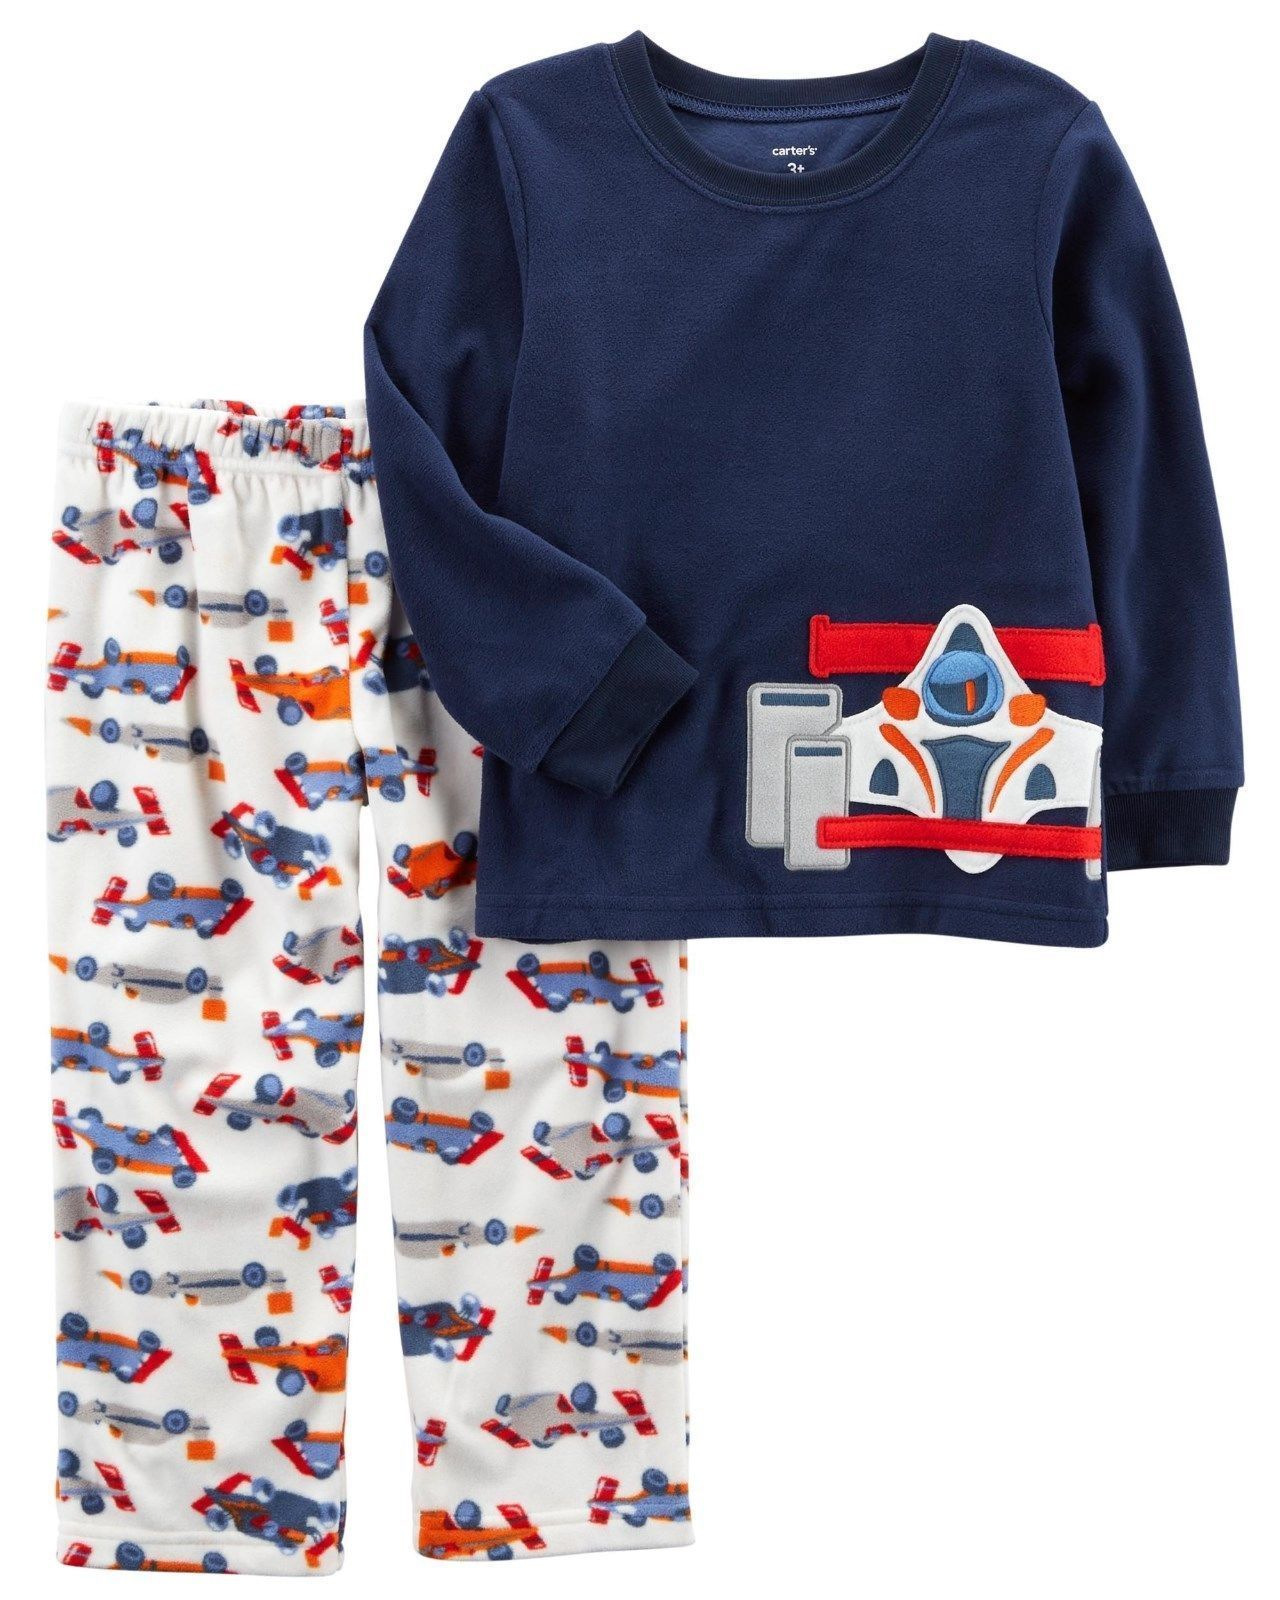 28f3741db Carter's Boys 2-Piece Fleece Pajama Set , Navy, Size 4T - $17.81